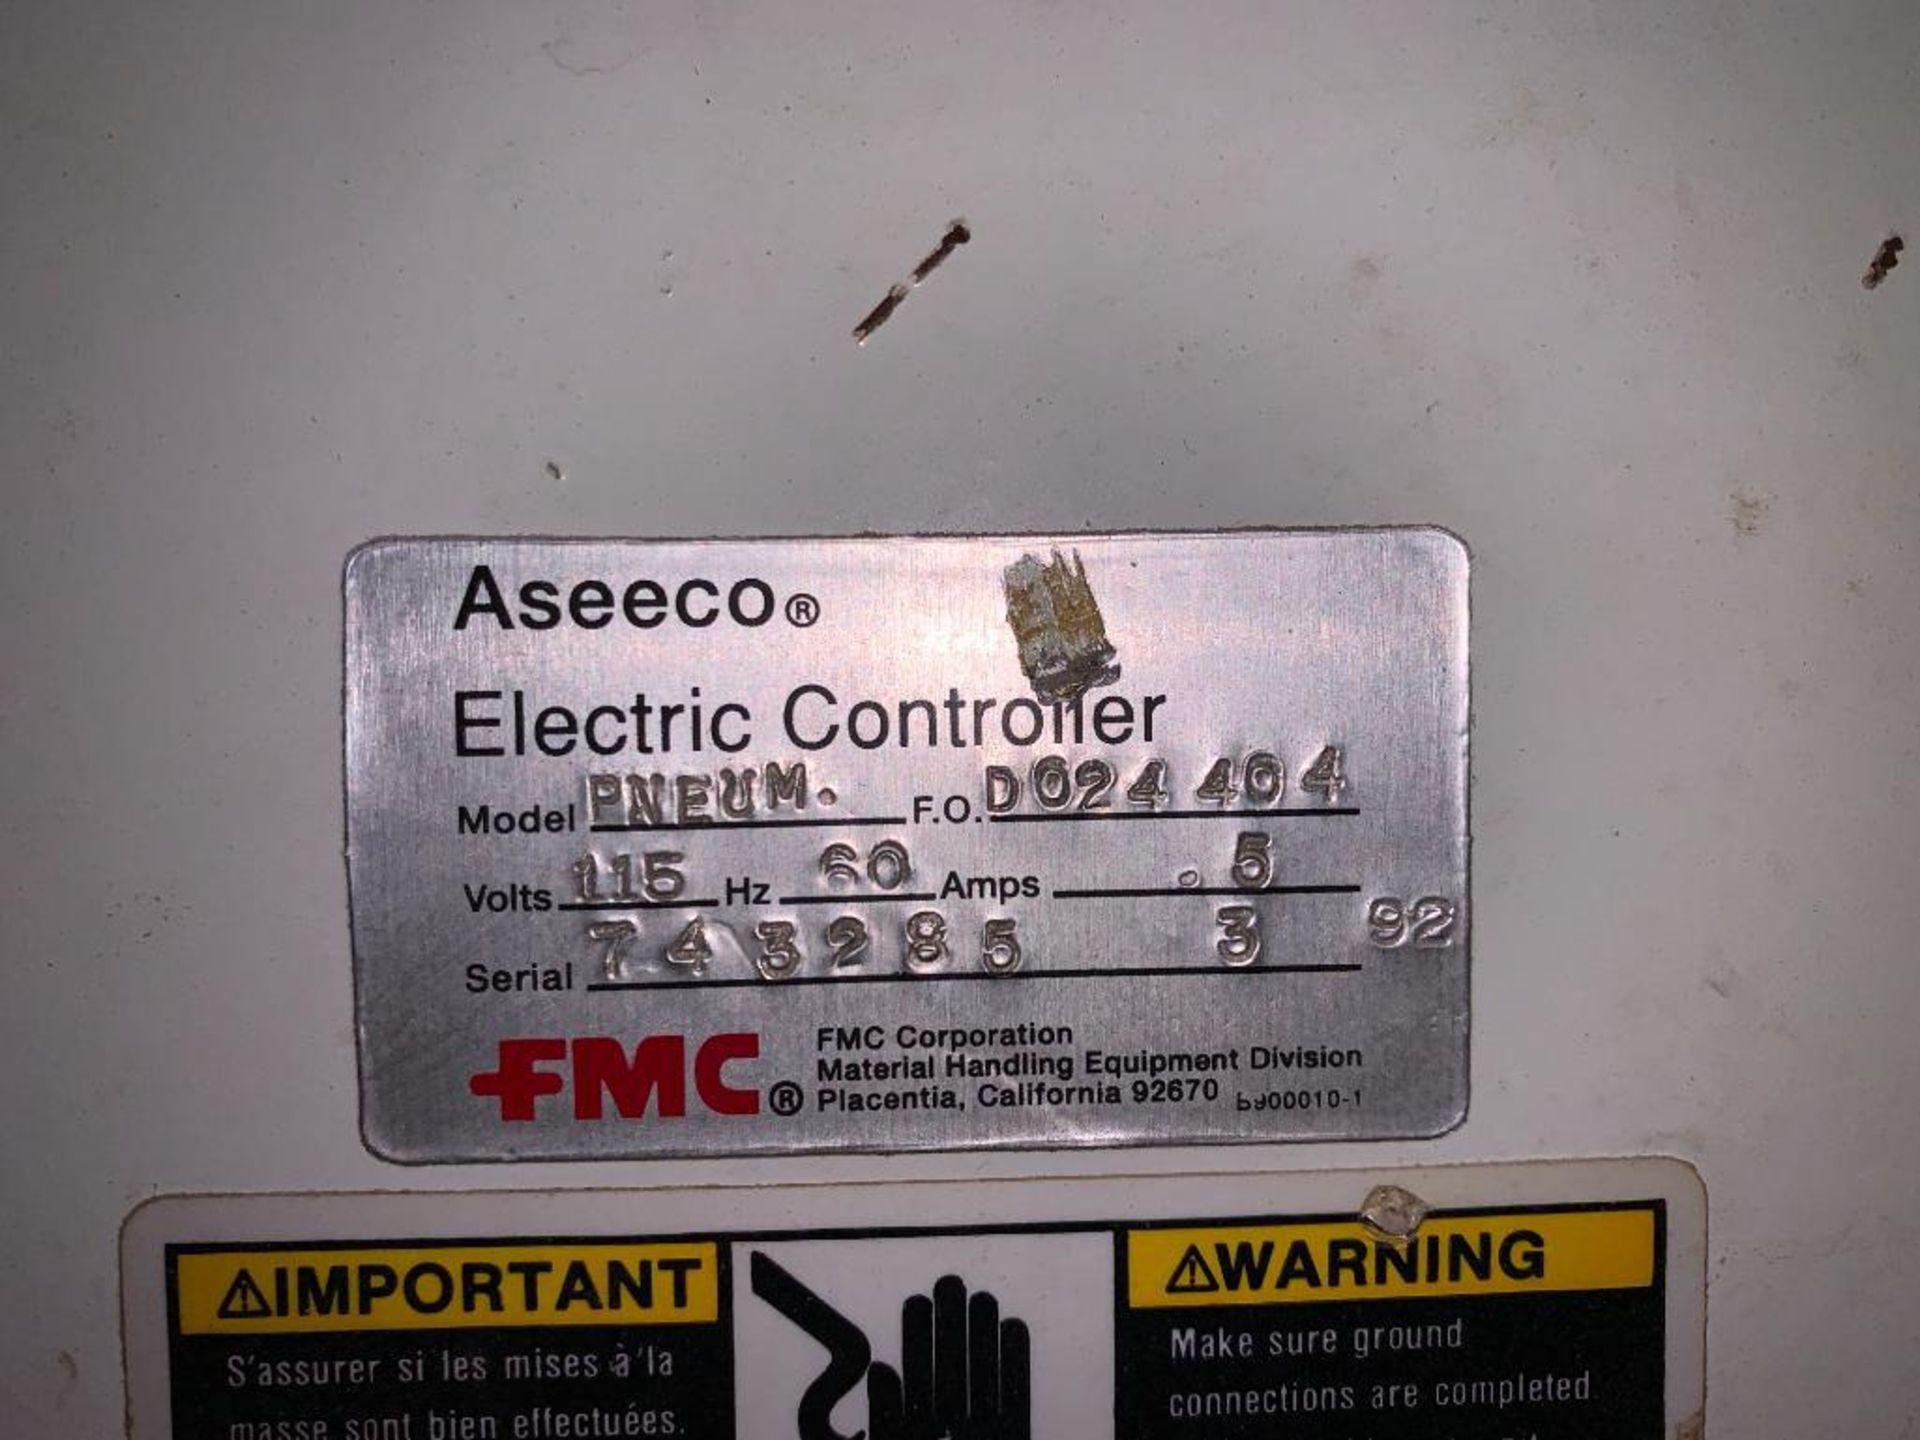 Aseeco mild steel cone bottom bulk storage bin - Image 11 of 23